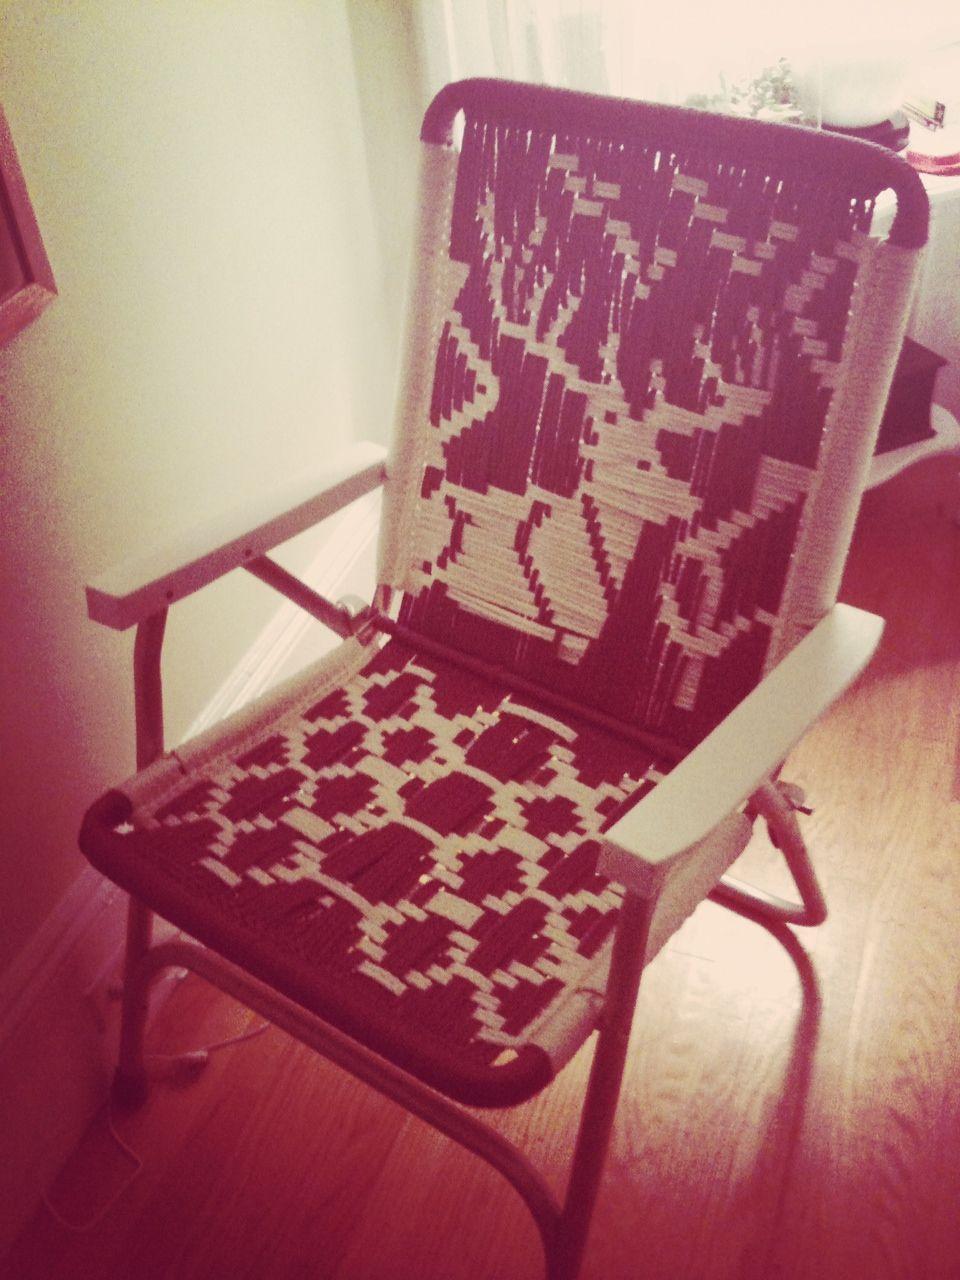 Macrame lawn chairs  macrame  Macrame chairs Macrame